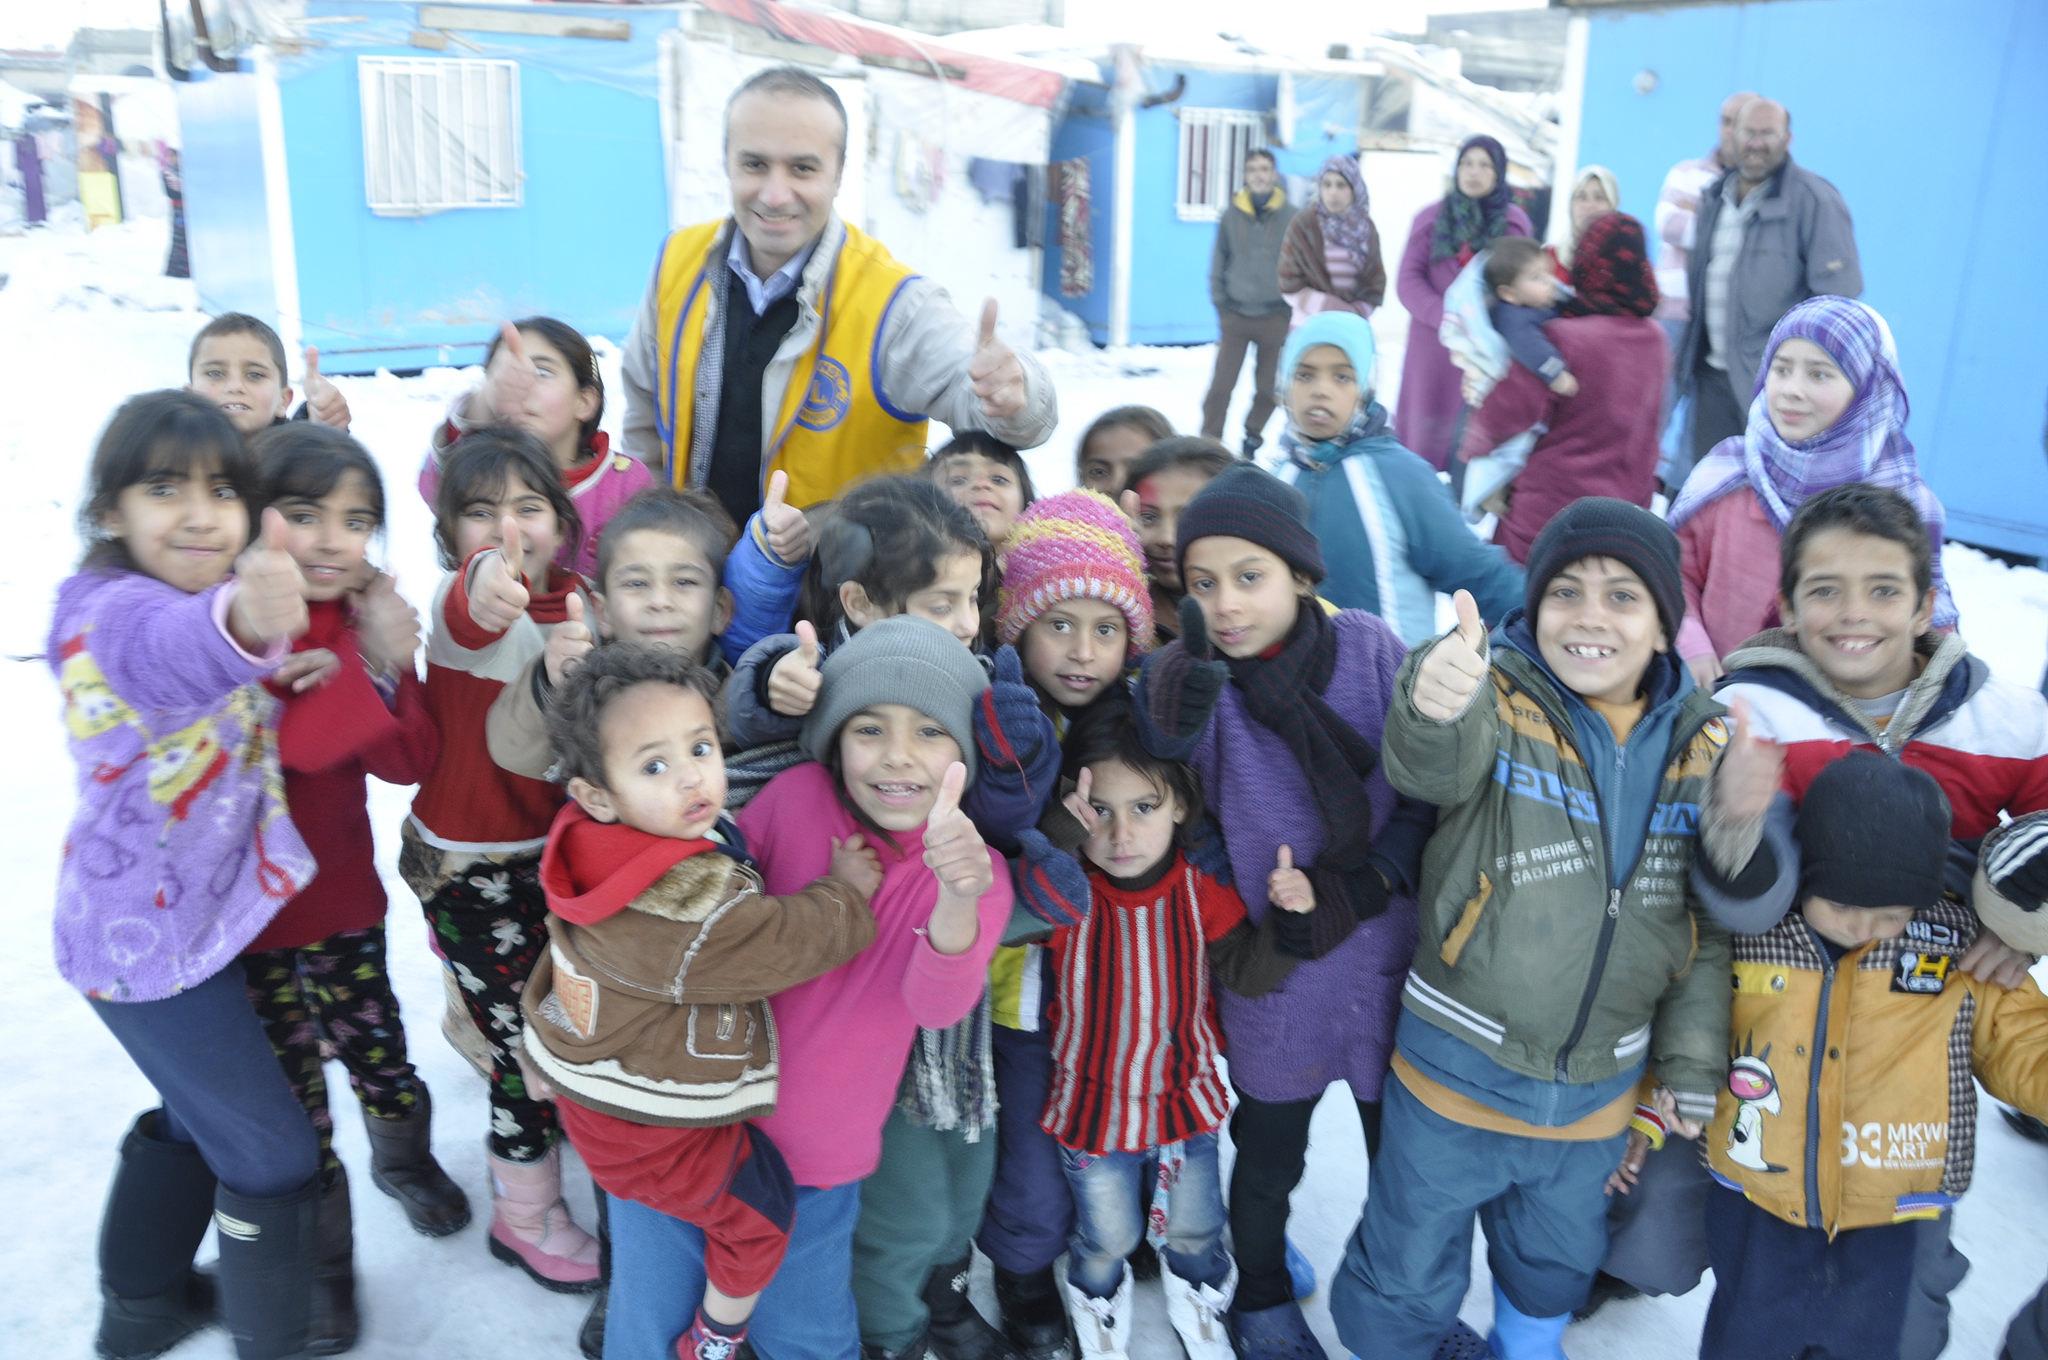 FLYKTINGKATASTROFEN I SYRIEN